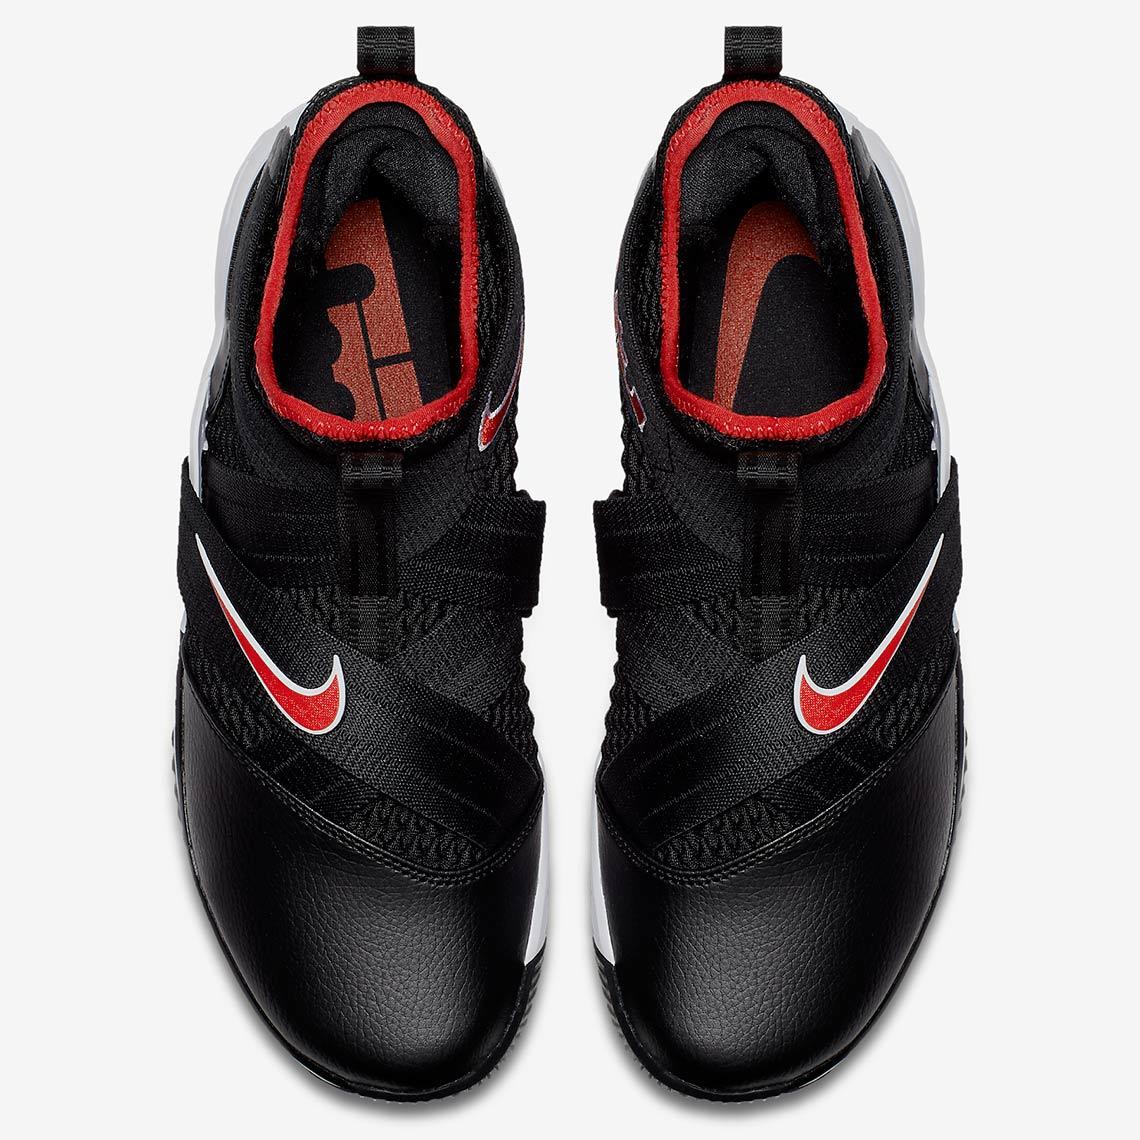 best website 1f4dd 1a7f2 Nike LeBron Soldier 12 Black/Red Release Info AO2609-001 ...